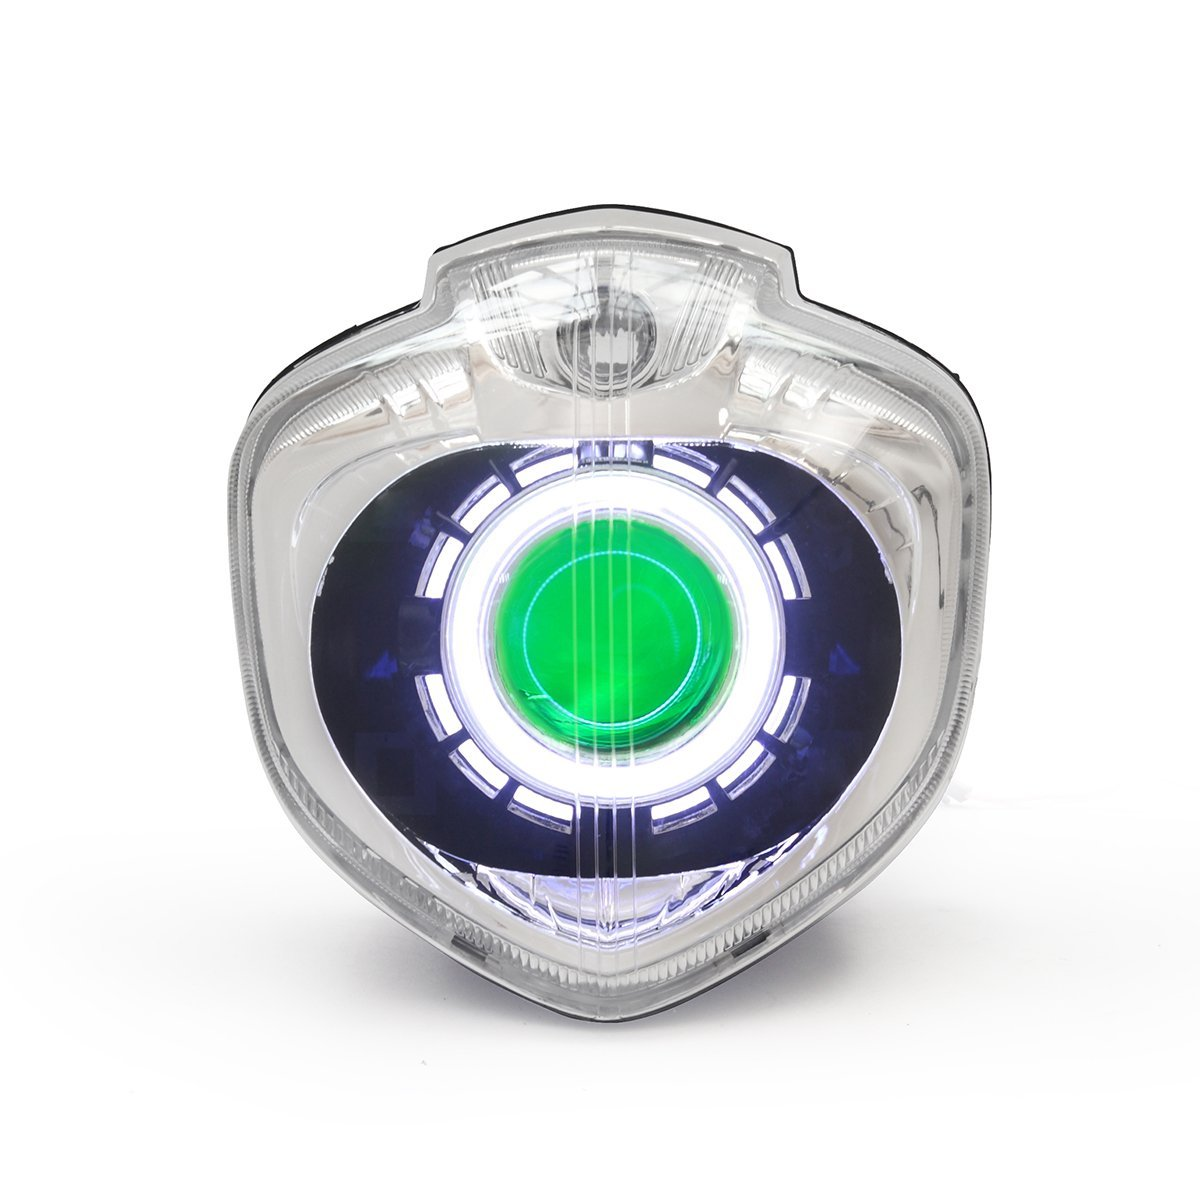 KT LED Angel Eye Headlight Assembly for Yamaha FZ6N 2004-2009 Green Demon Eye